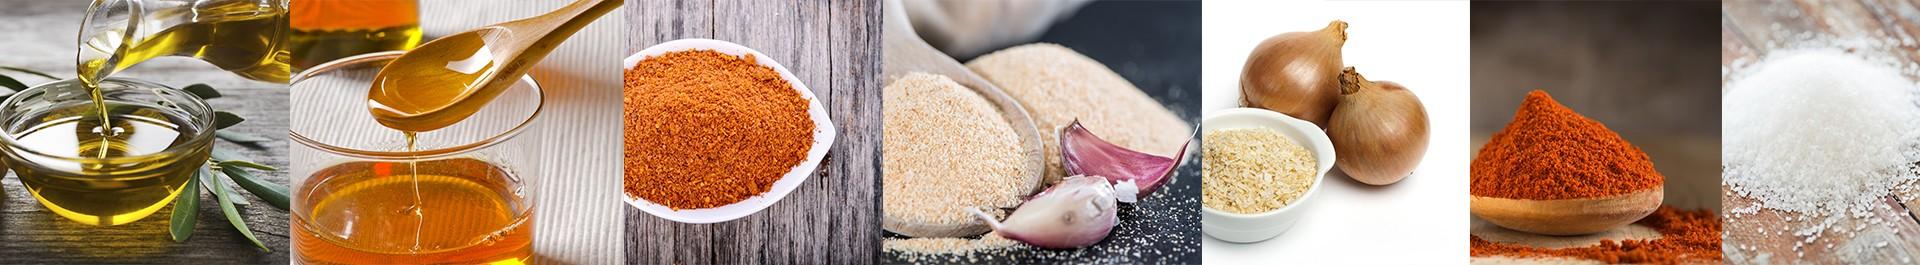 bbq seeds ingredients